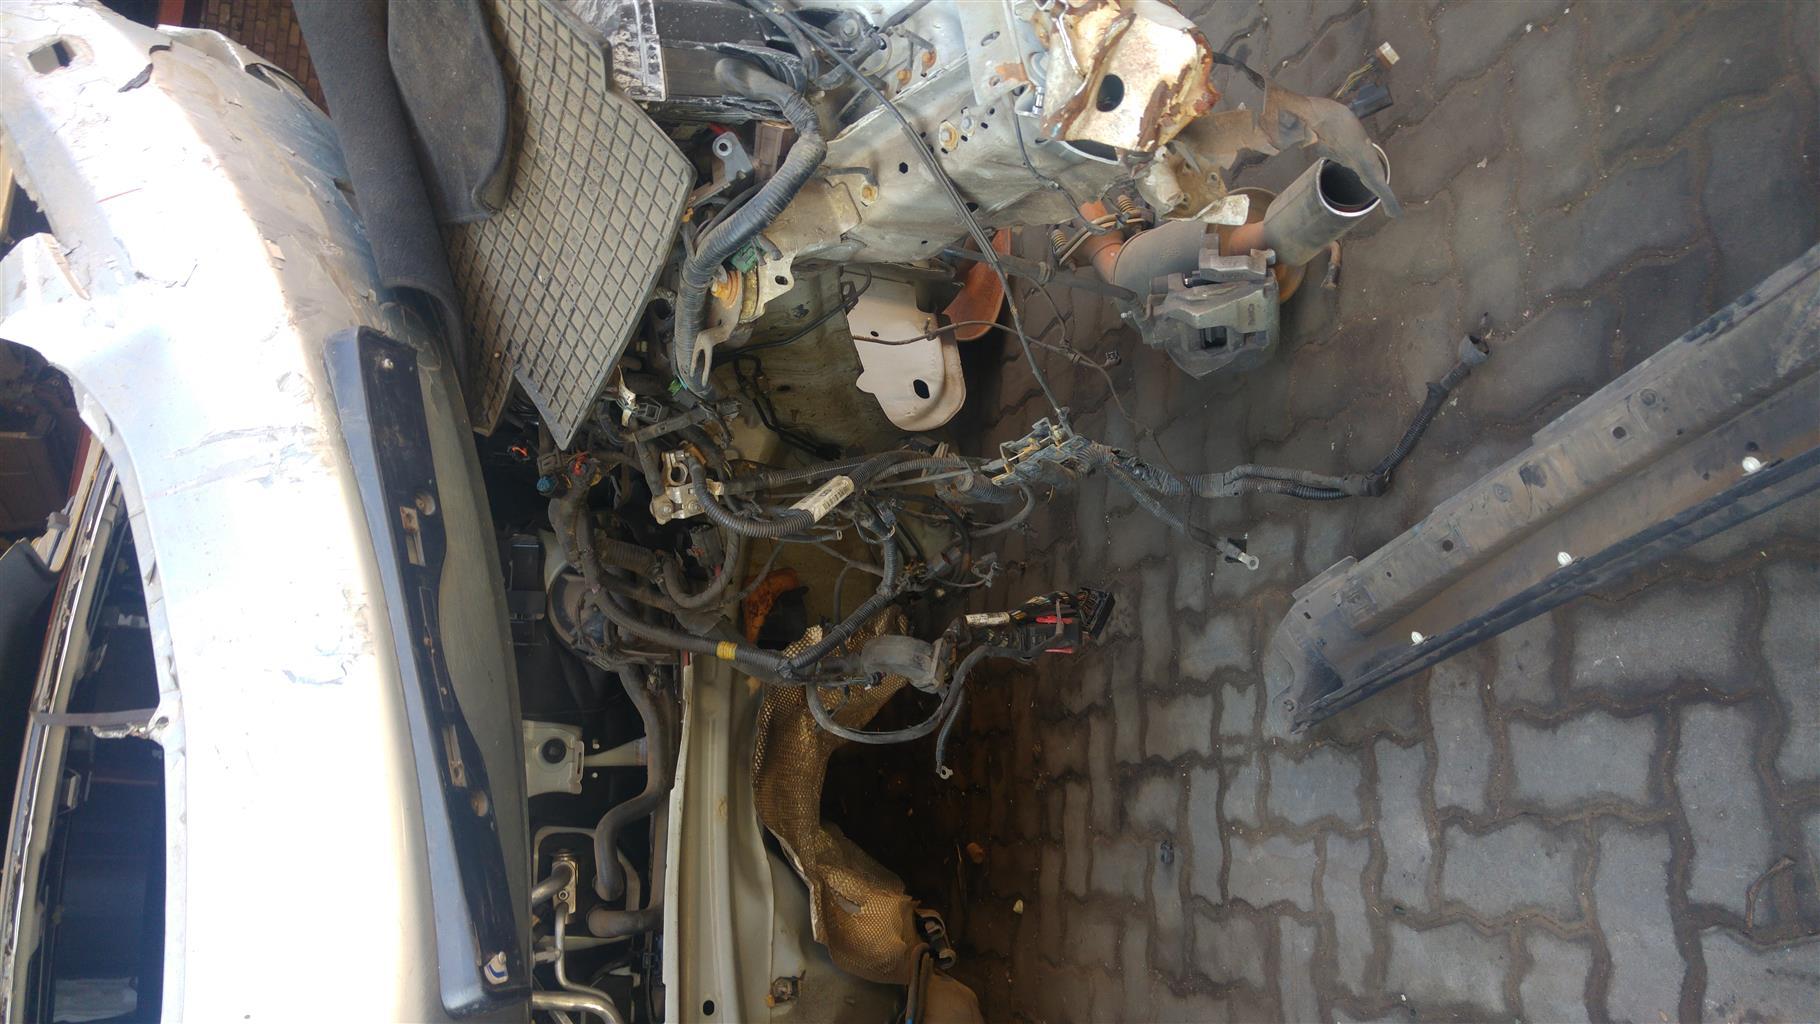 Peachy Range Rover Evoque 2014 Stripping For Spares Engine Wiring Harness Wiring Cloud Xeiraioscosaoduqqnet